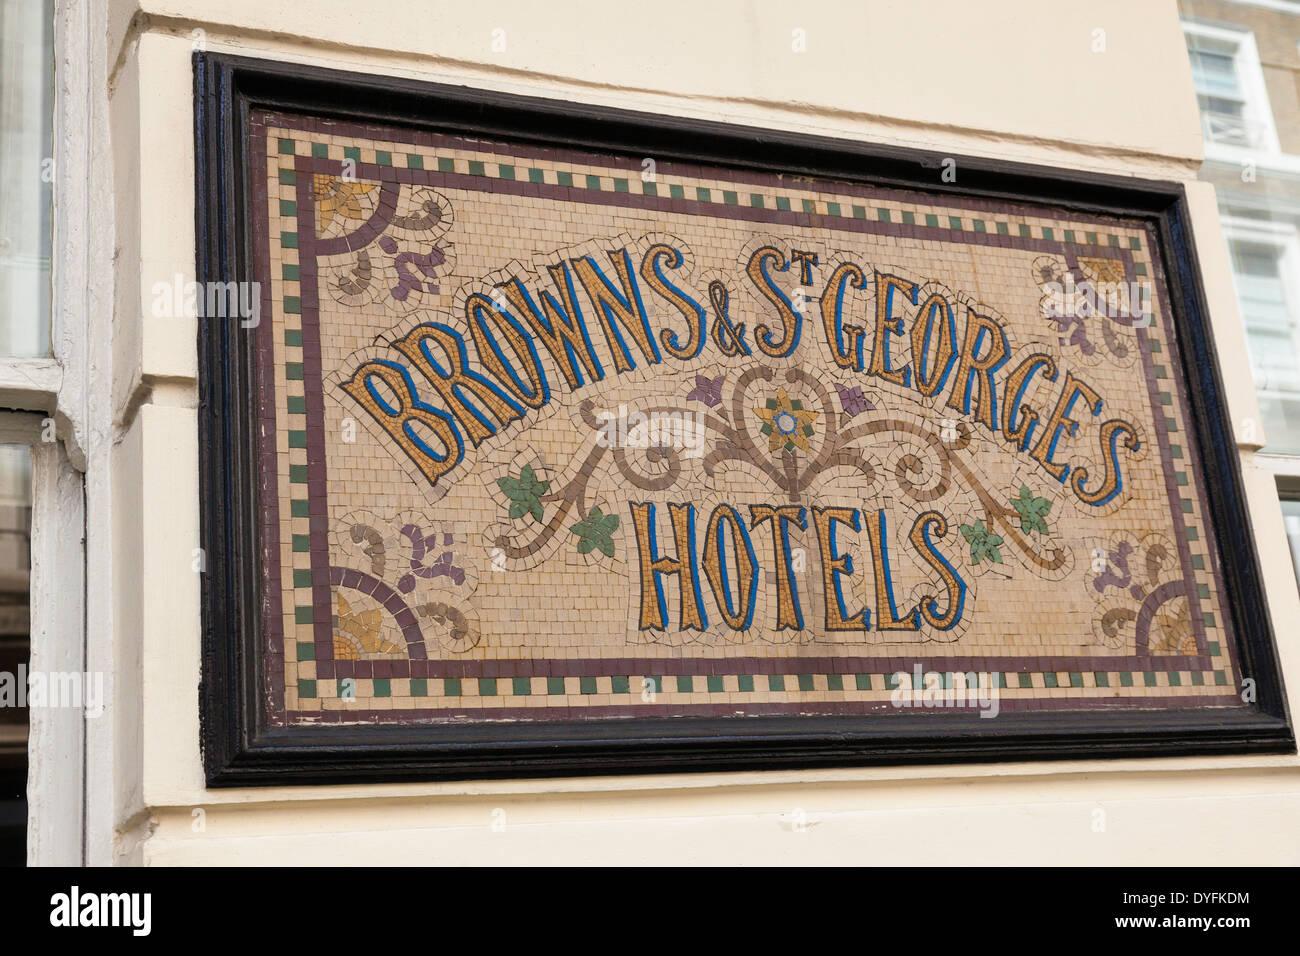 Sign, Browns & St Georges Hotels, Albermarle Street, London, UK - Stock Image